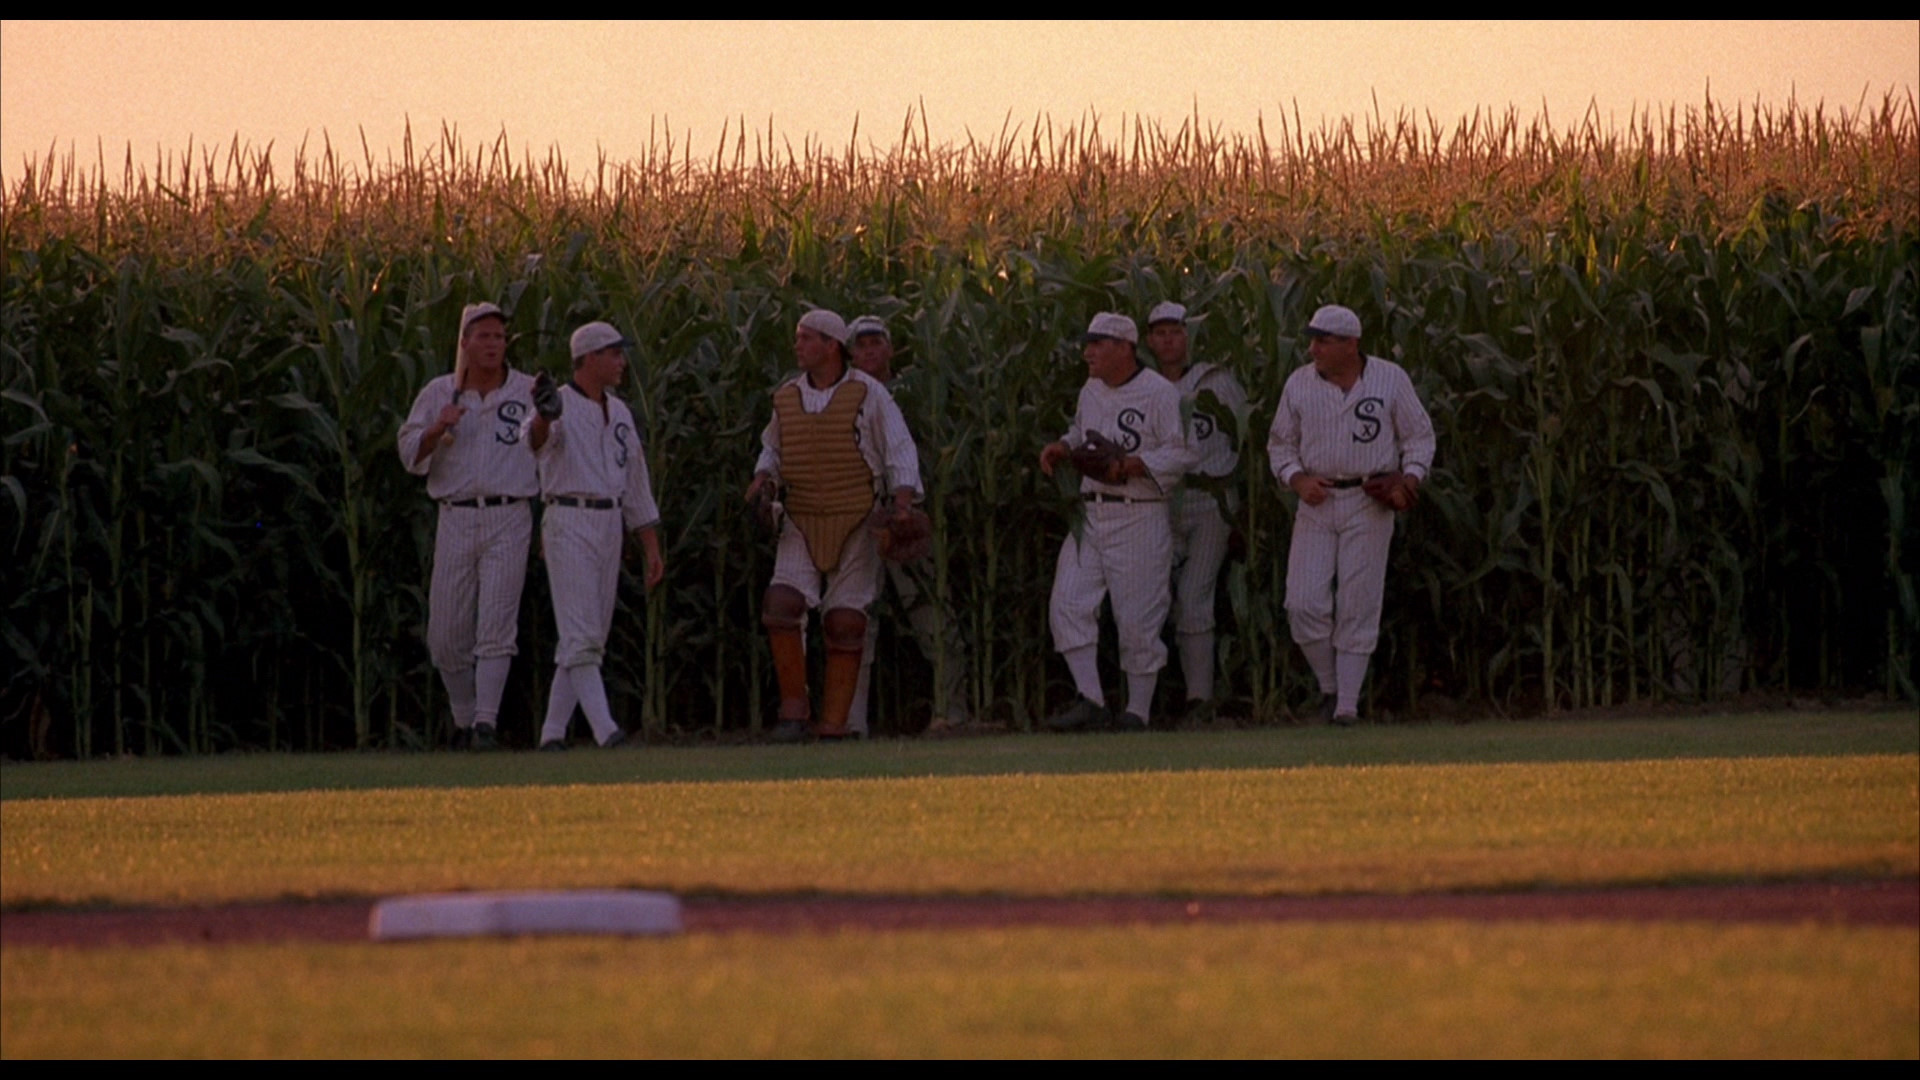 Kevin Costner's Field of Dreams